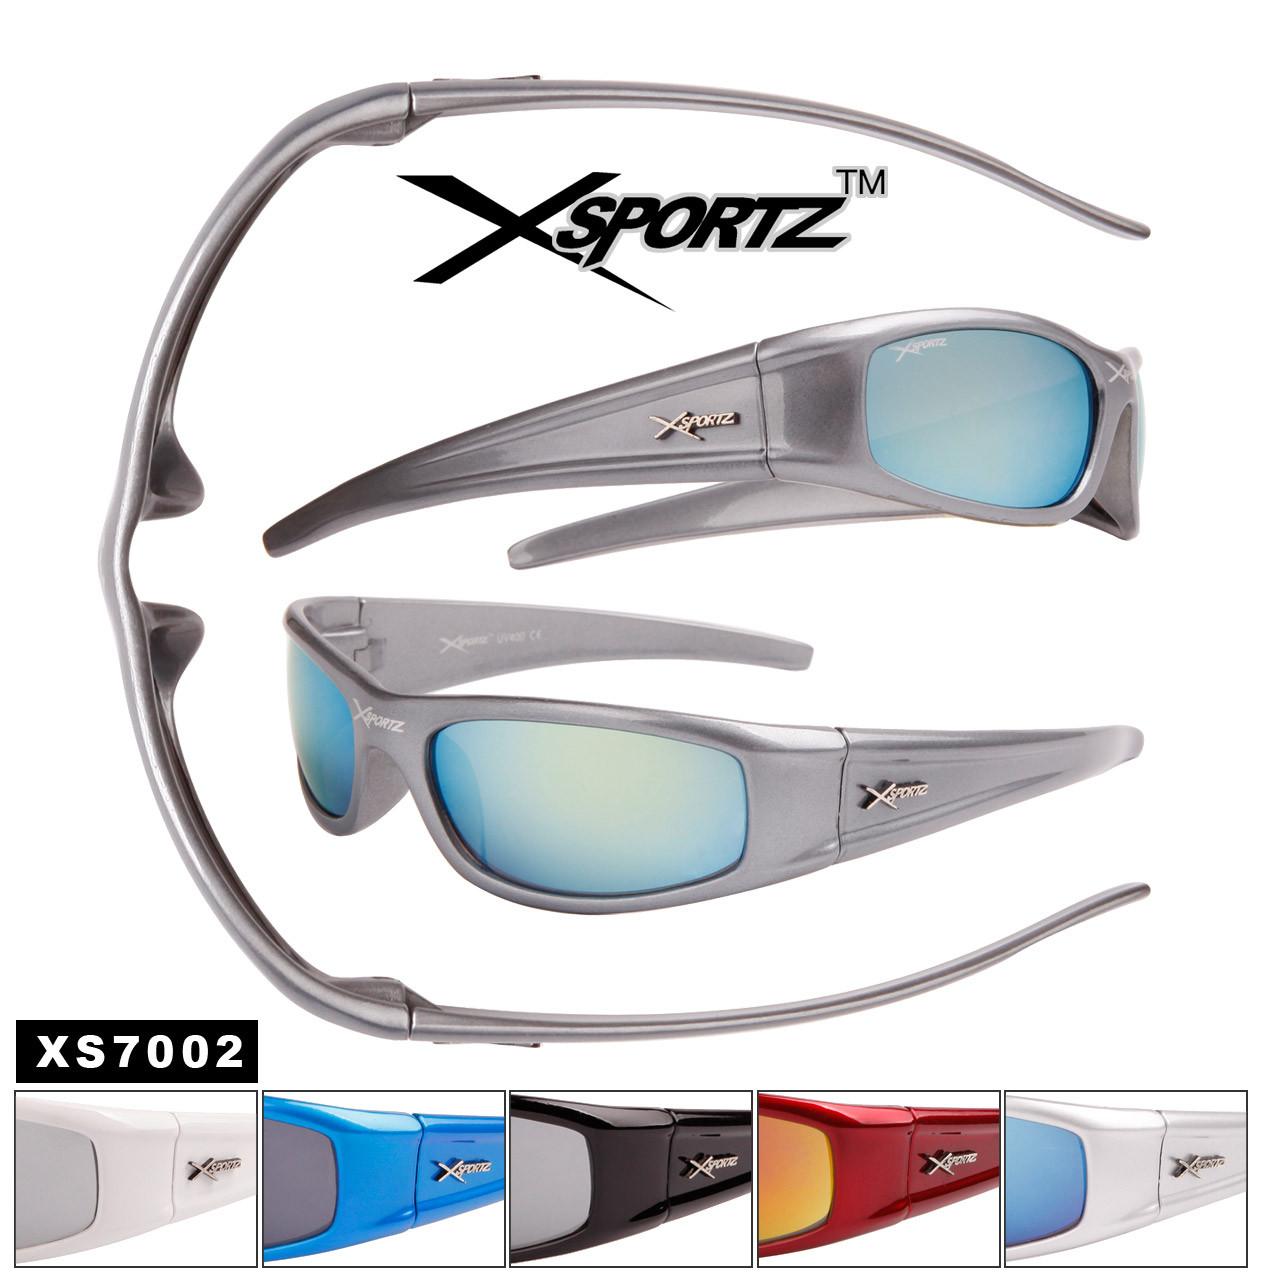 Xsportz™ Men's Sunglasses by the Dozen - Style #XS7002